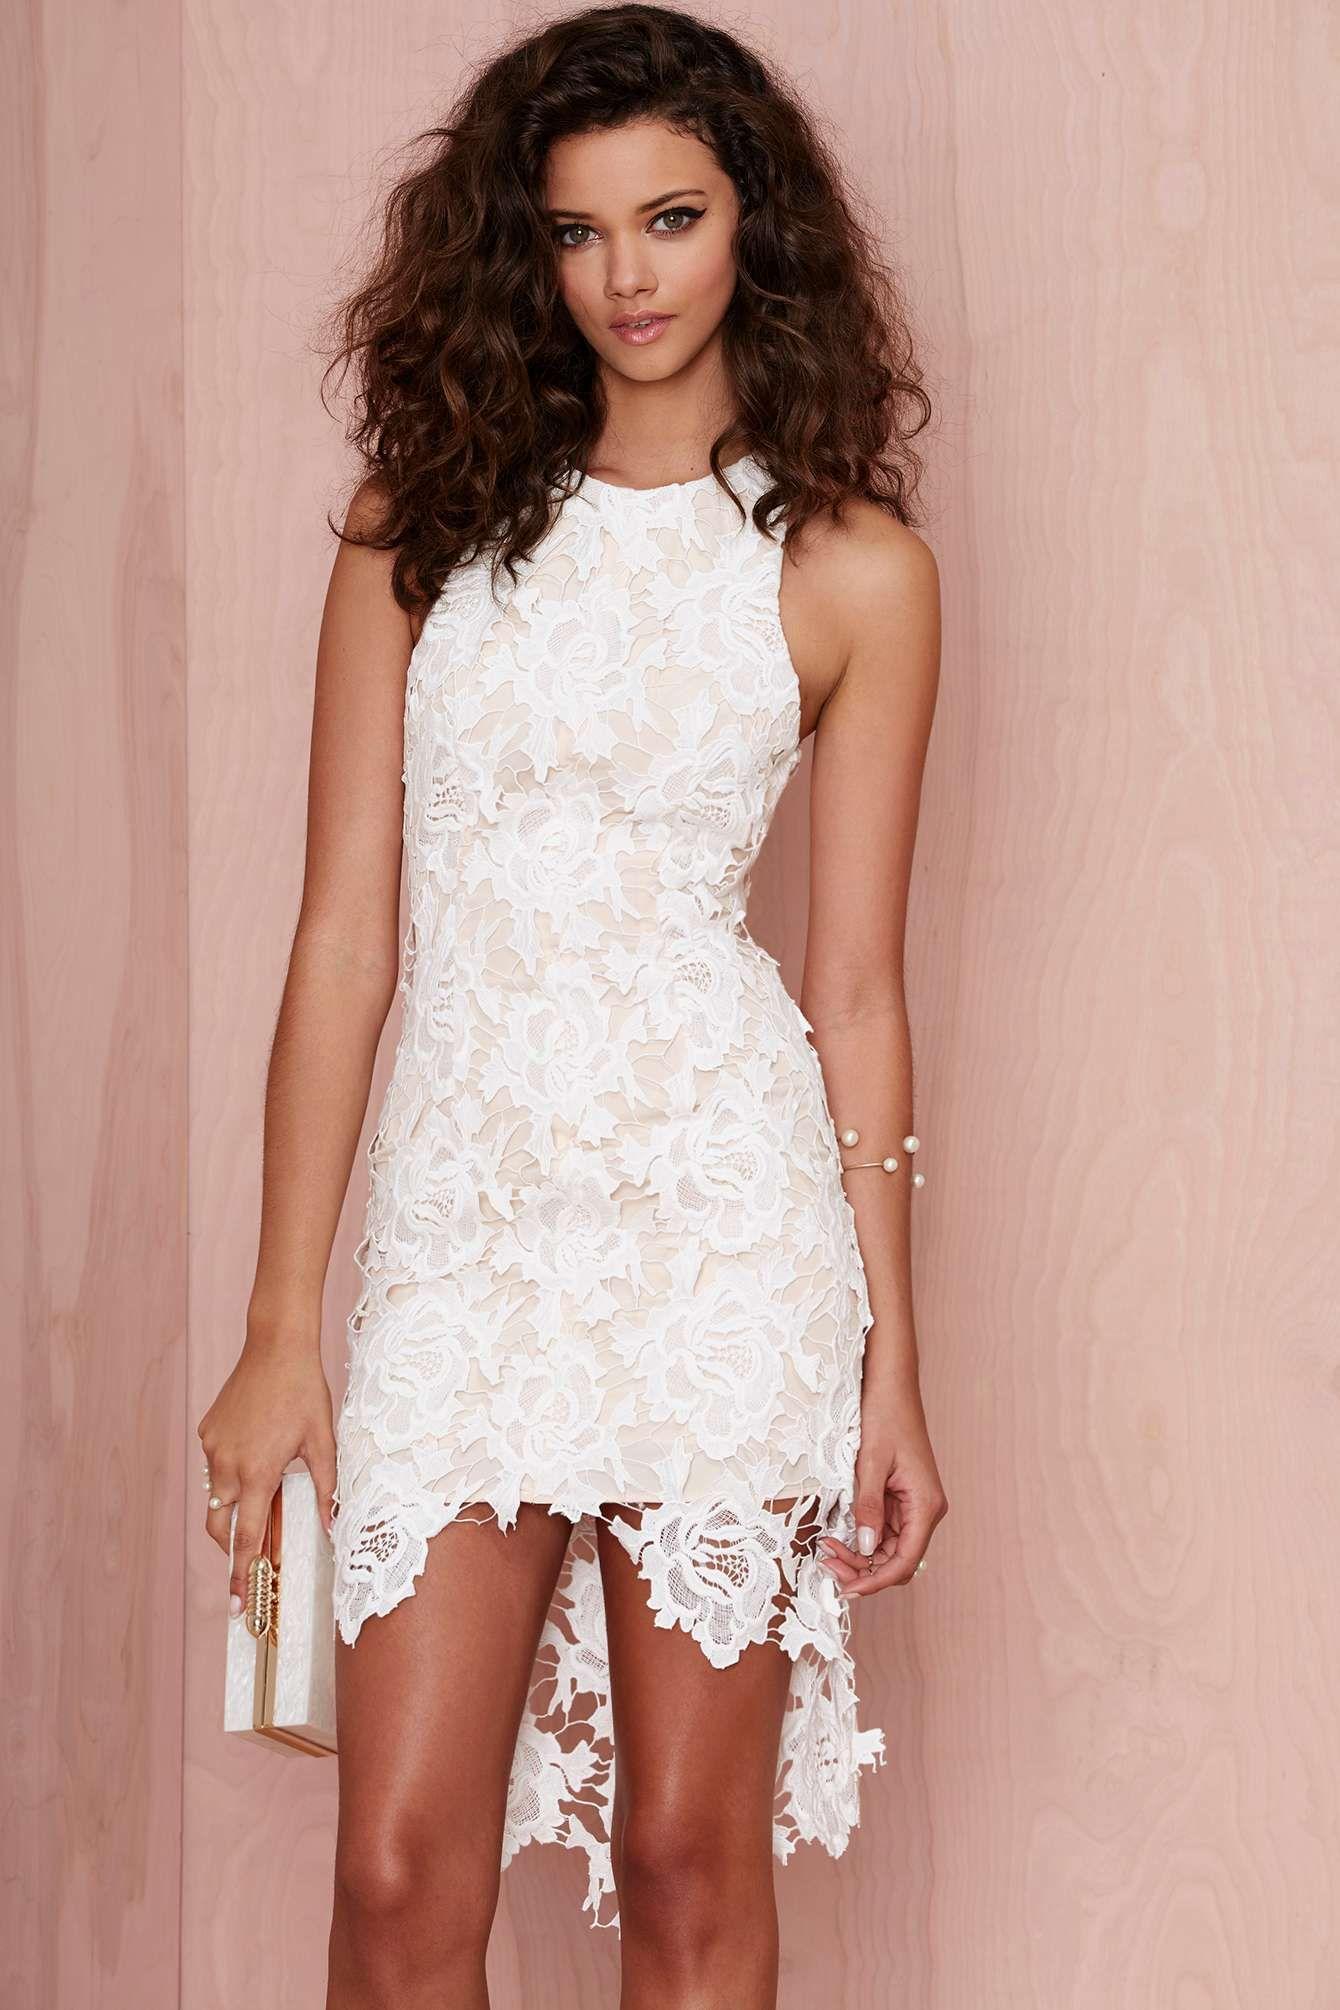 Cocktail dresses for wedding reception  Keepsake I Will Wait Lace Dress  My Style  Pinterest  Lace dress